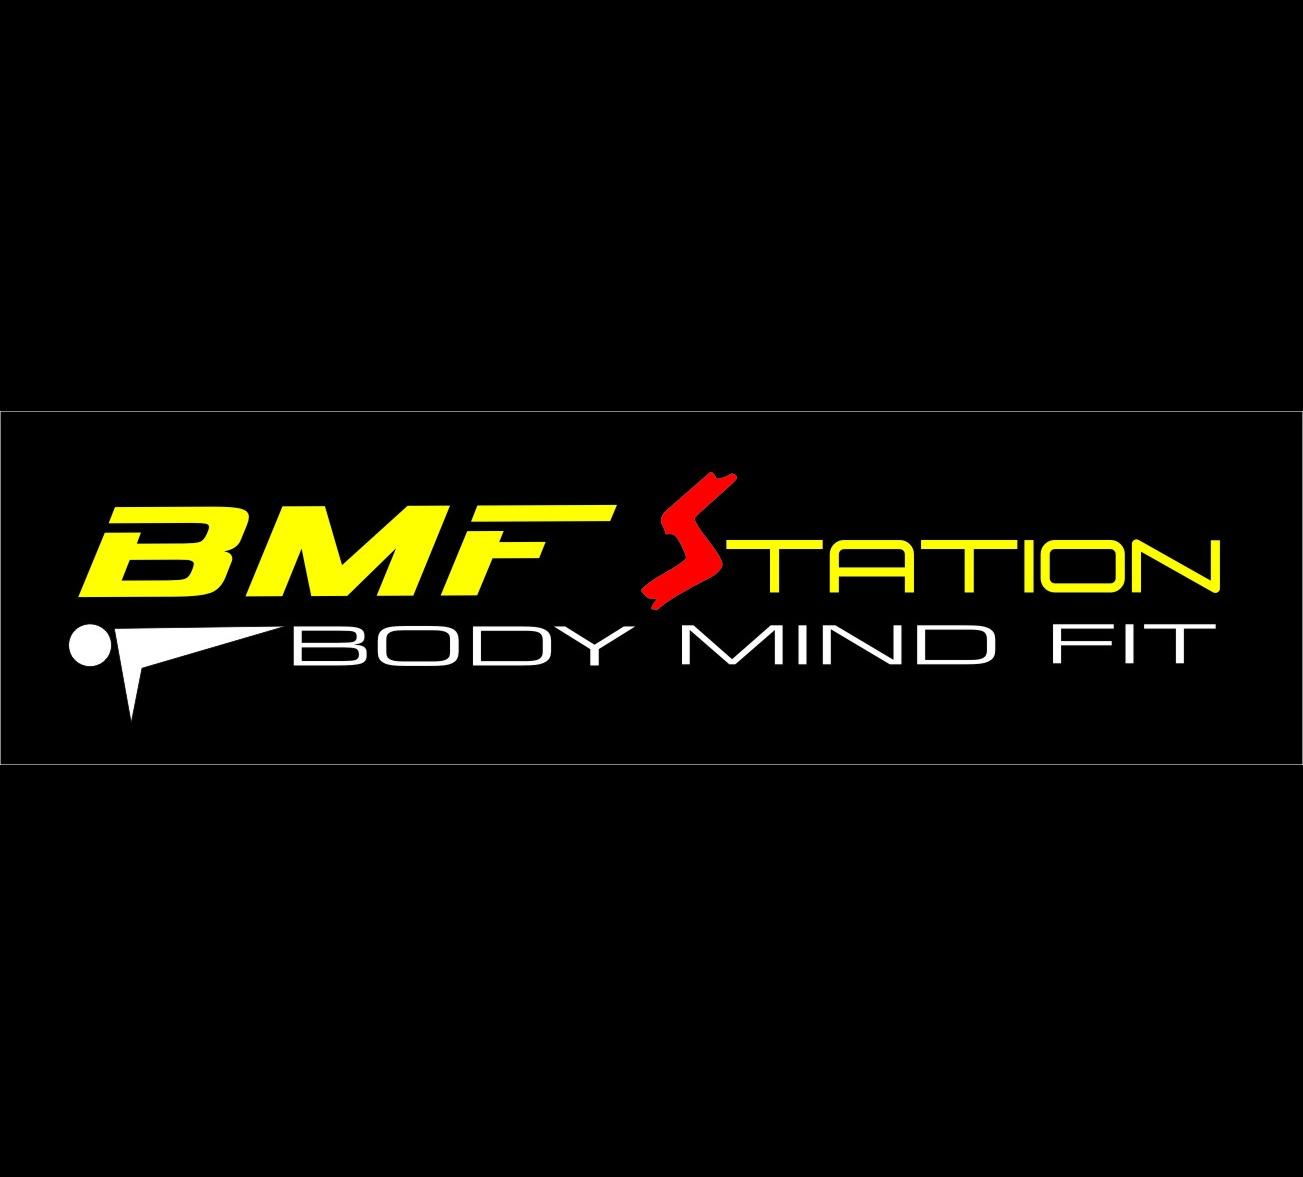 BMF Station